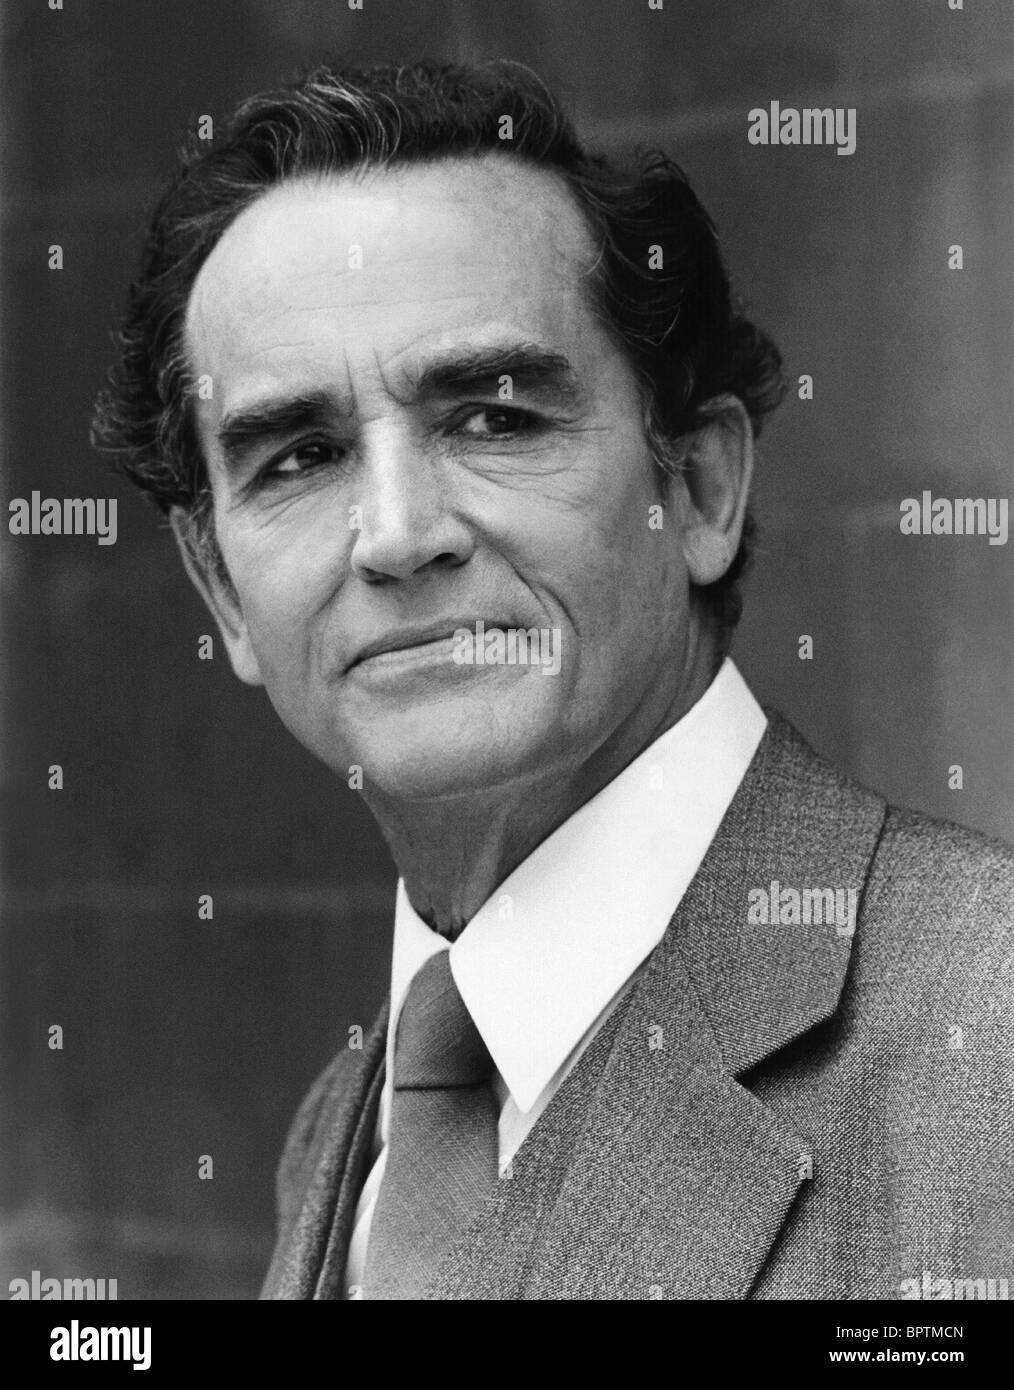 VITTORIO GASSMAN ACTOR (1980) - Stock Image